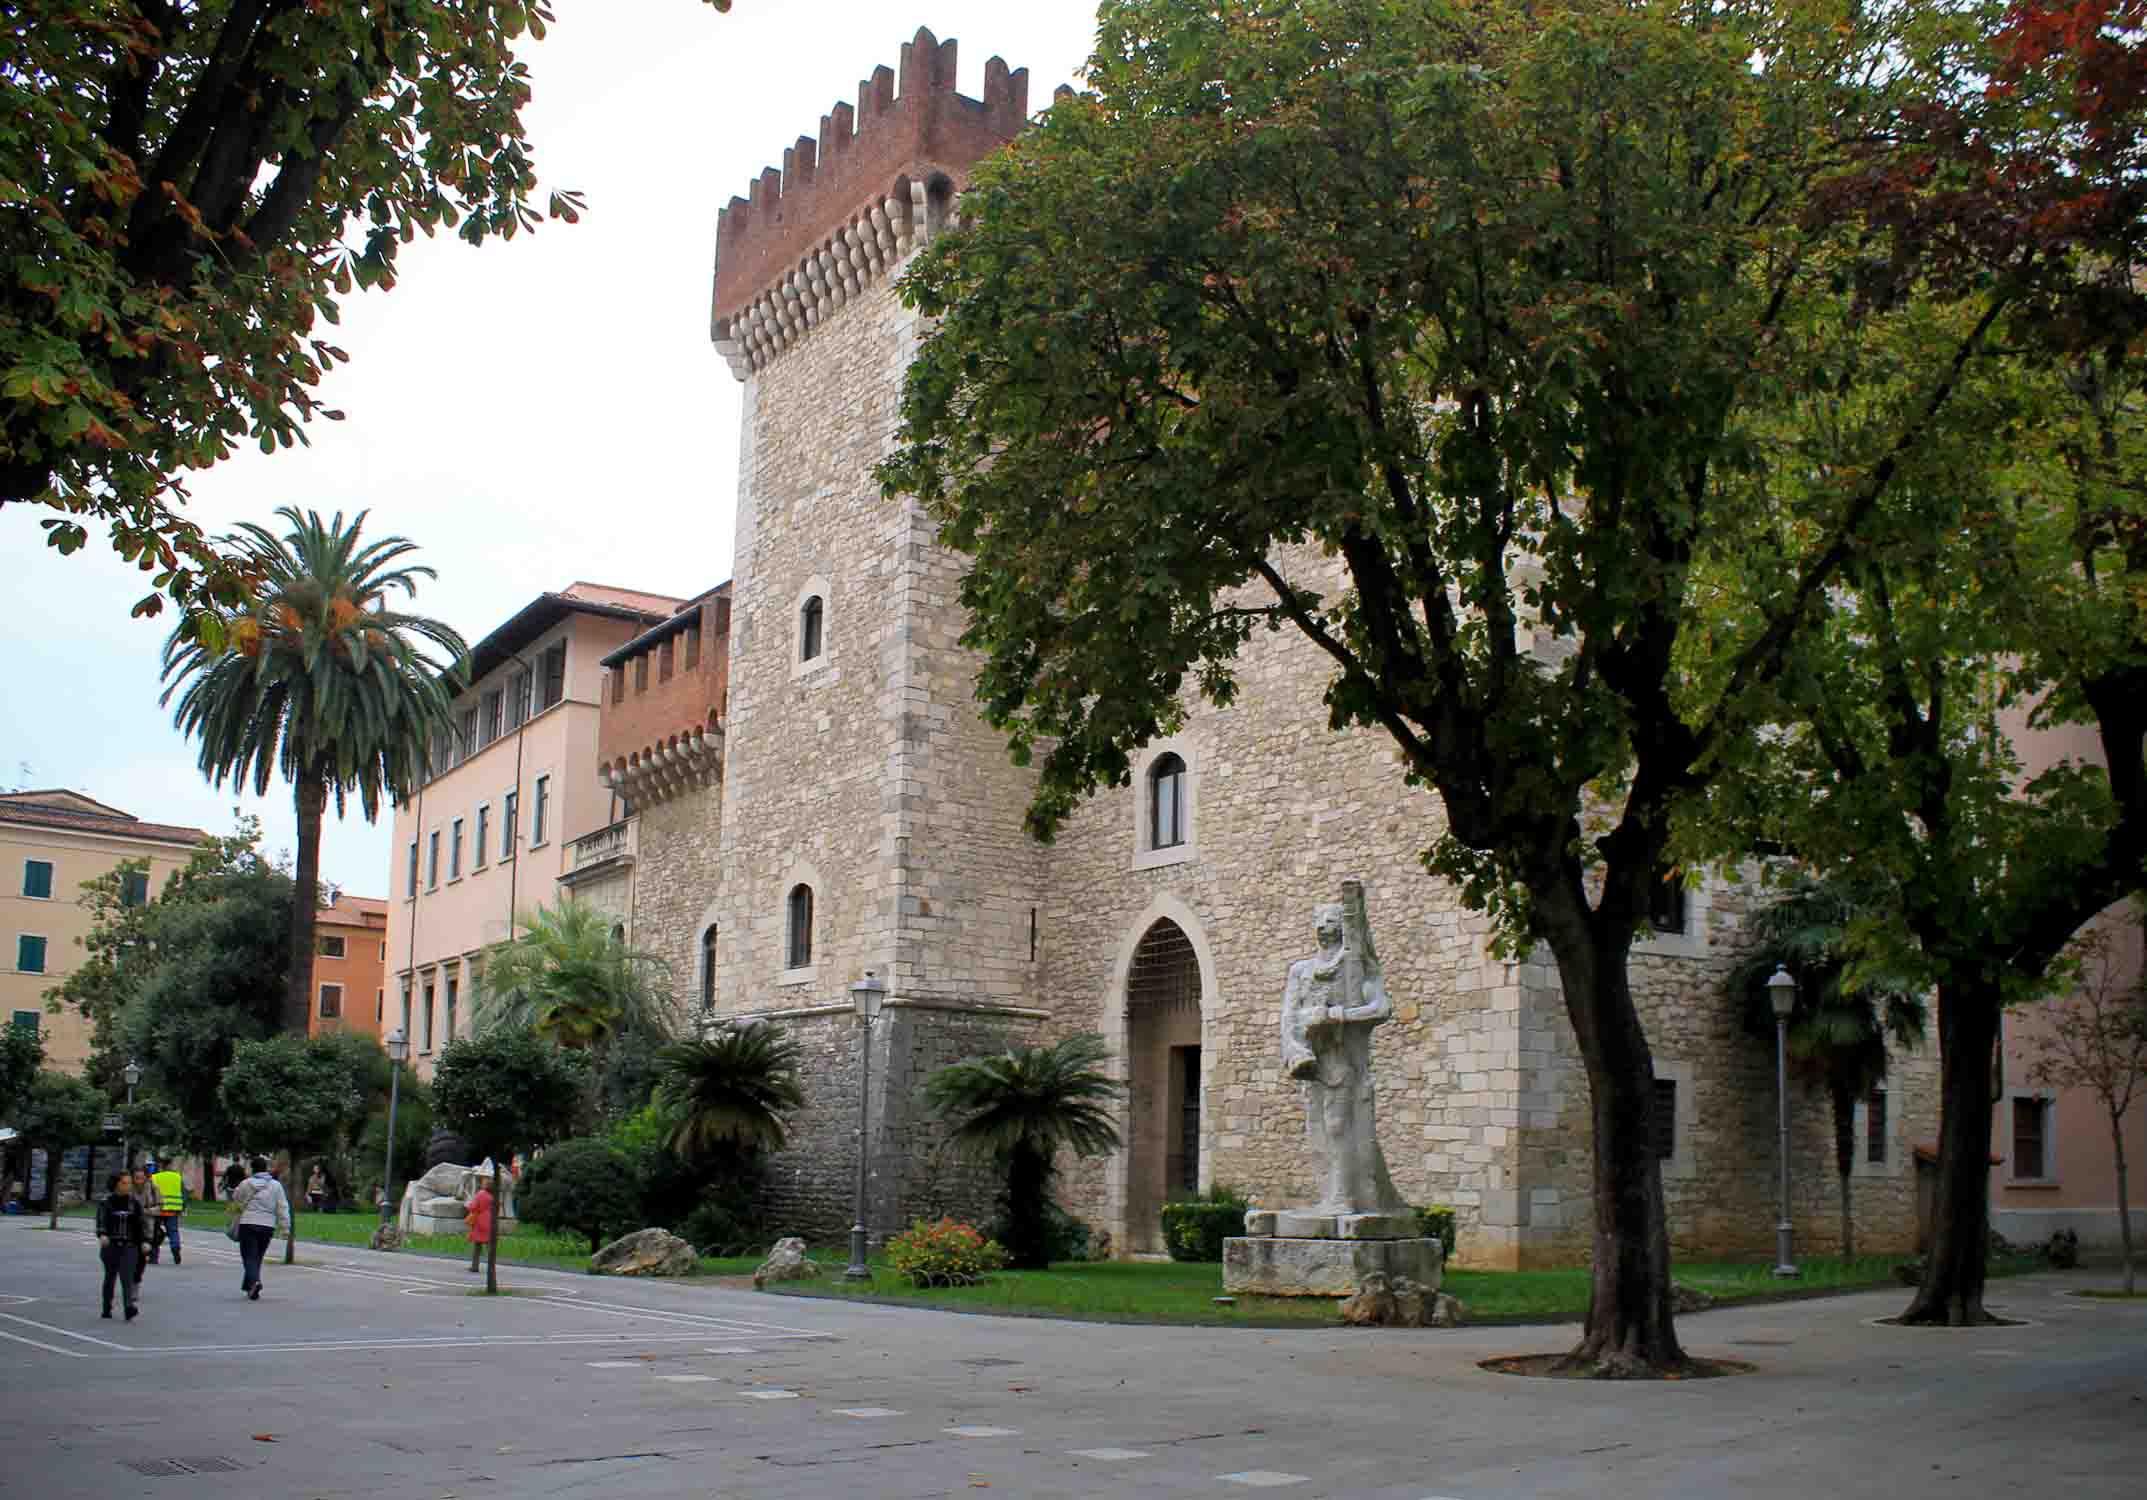 Palazzo Cybo-Malaspina in Carrara